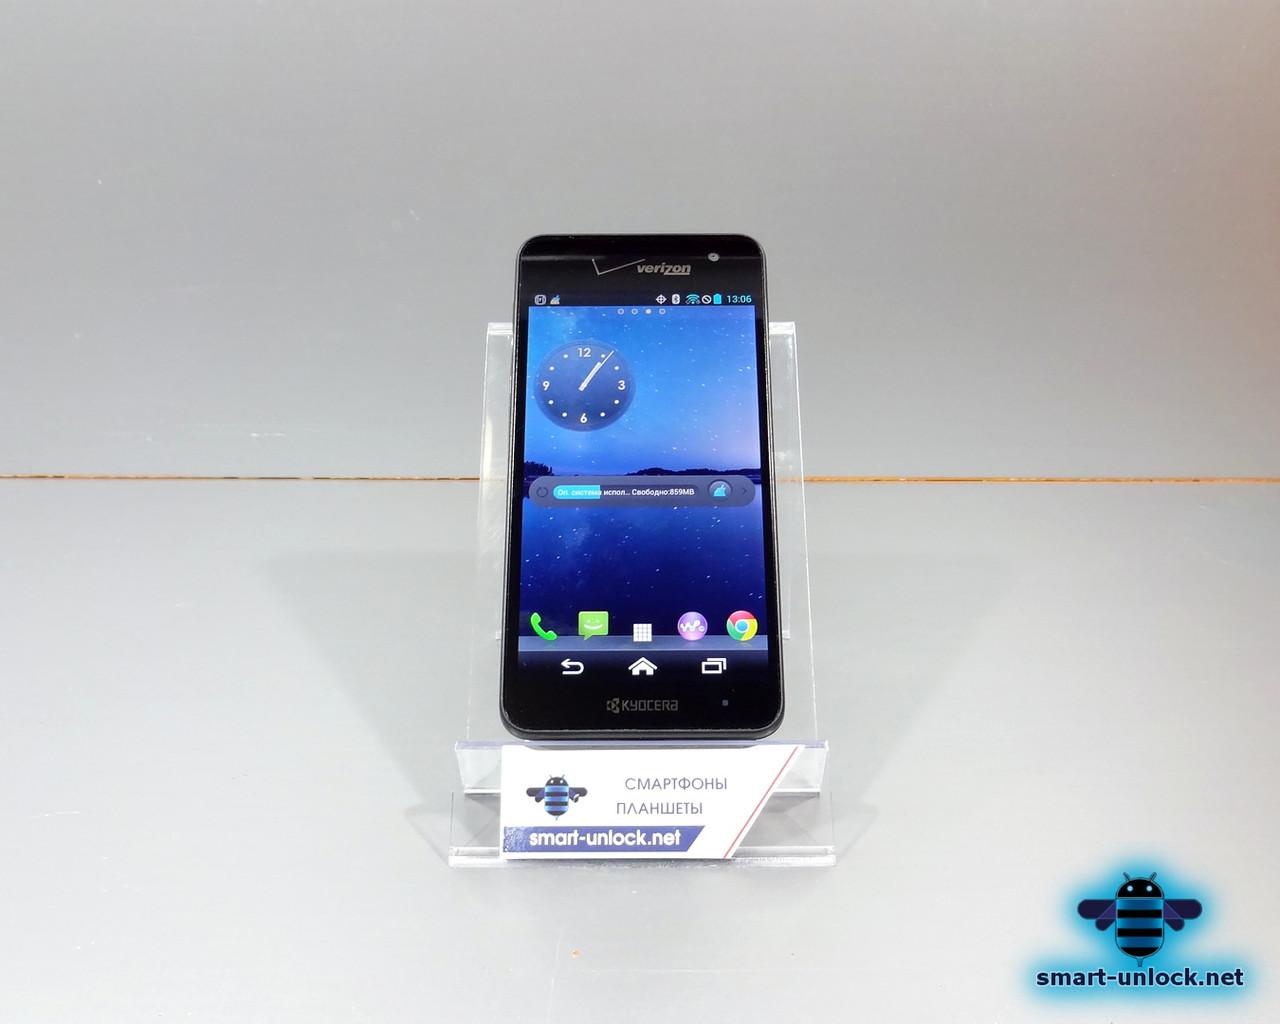 Телефон, смартфон Kyocera Hydro Elite C6750 Покупка без риска! Гарантия!